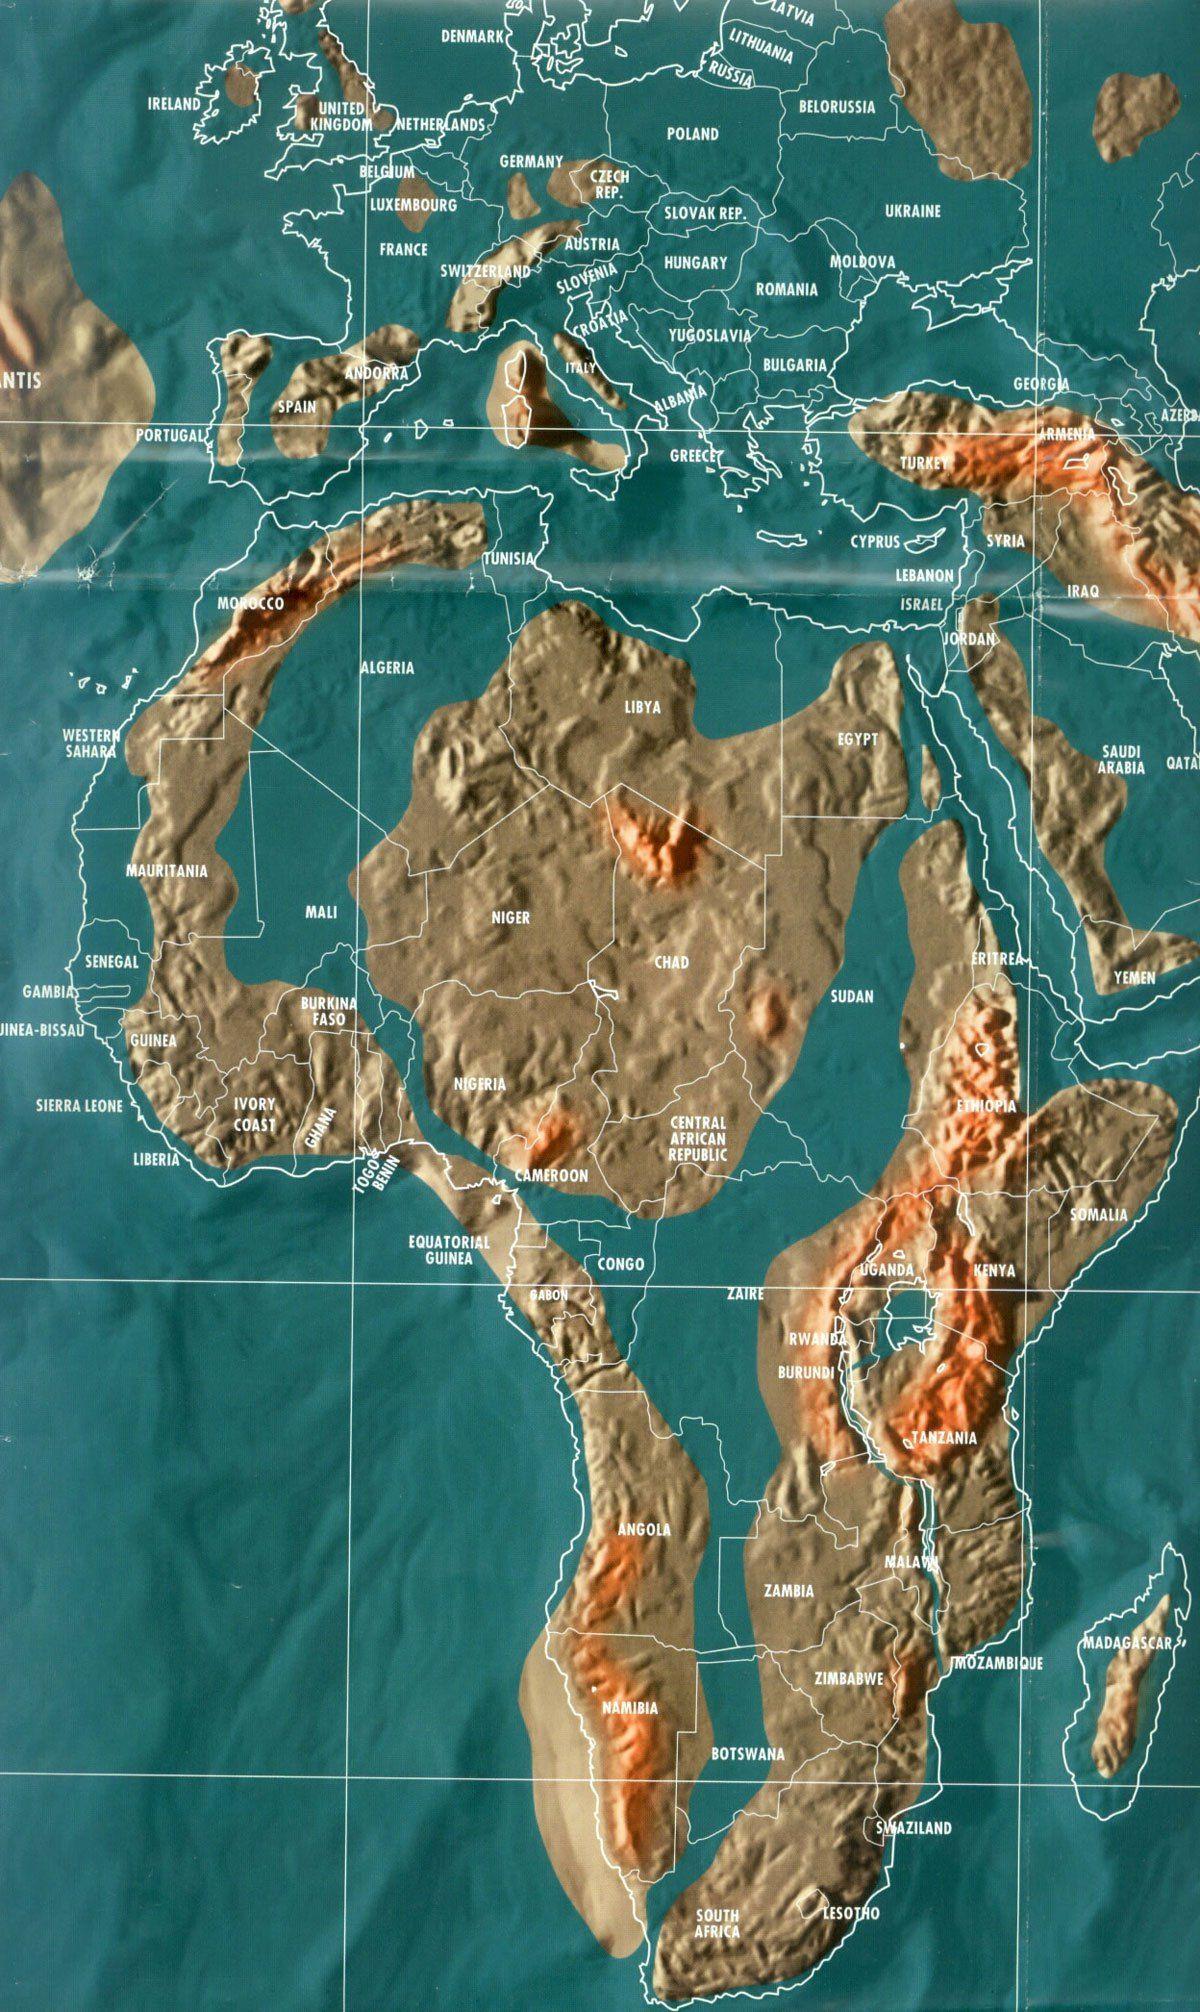 Ley Lines Map California - Exploring Mars